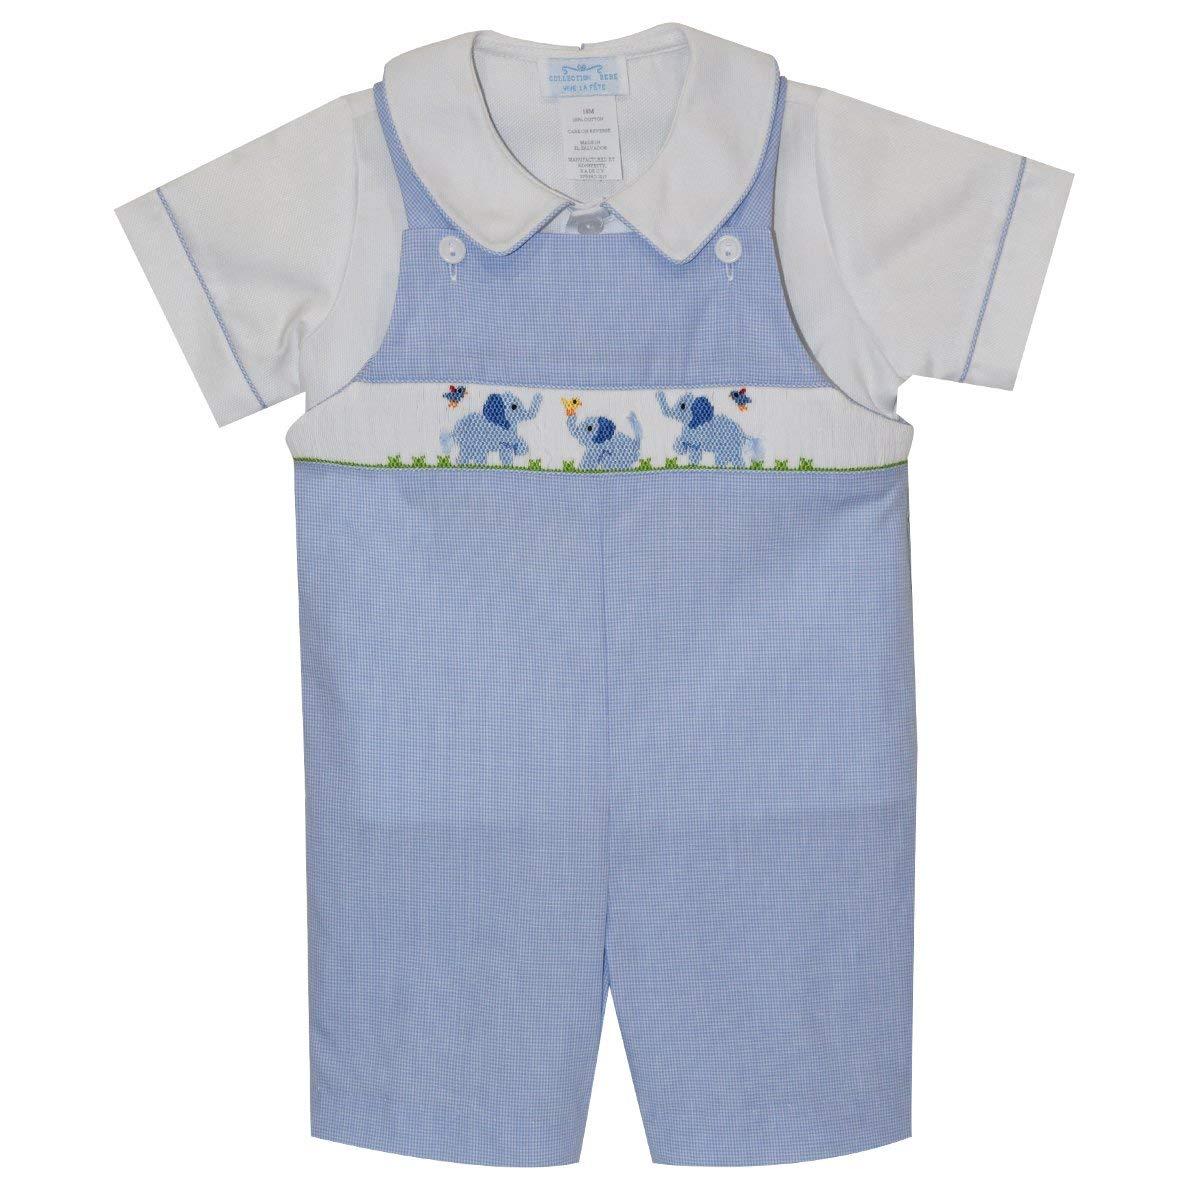 Collection Bebe Baby Elephants Smocked Boys Shortall Short Sleeve Blue